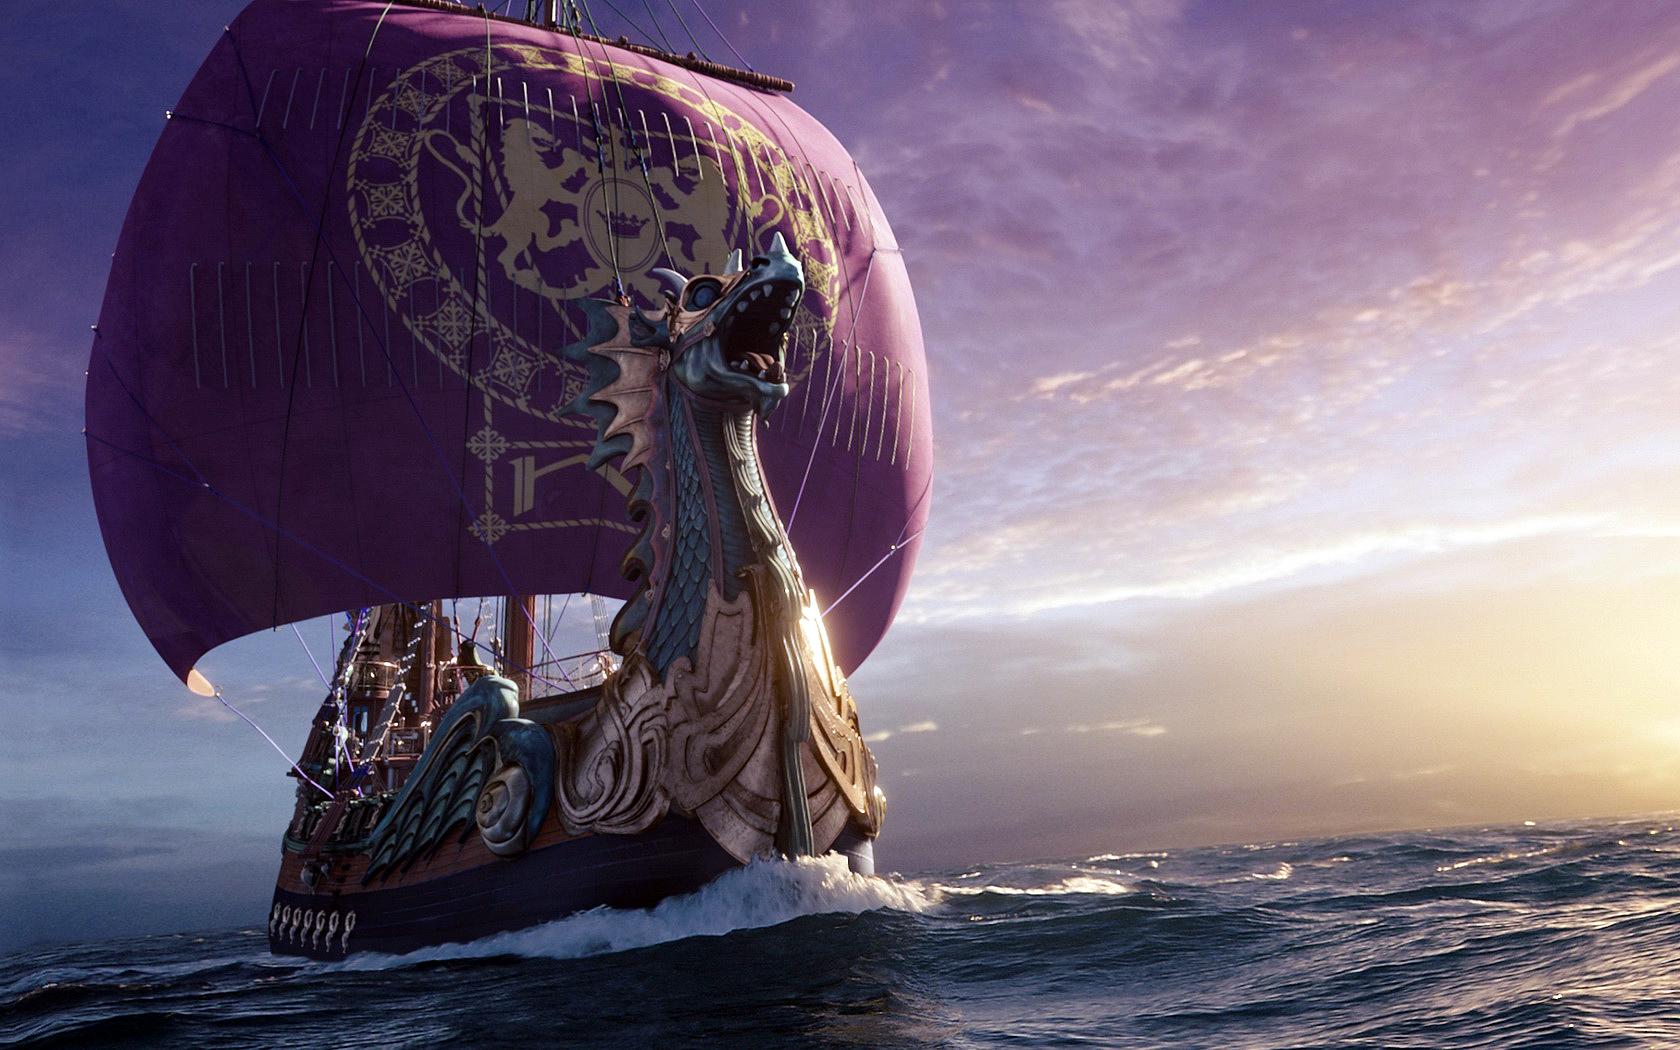 Viking Ship Wallpaper - WallpaperSafari